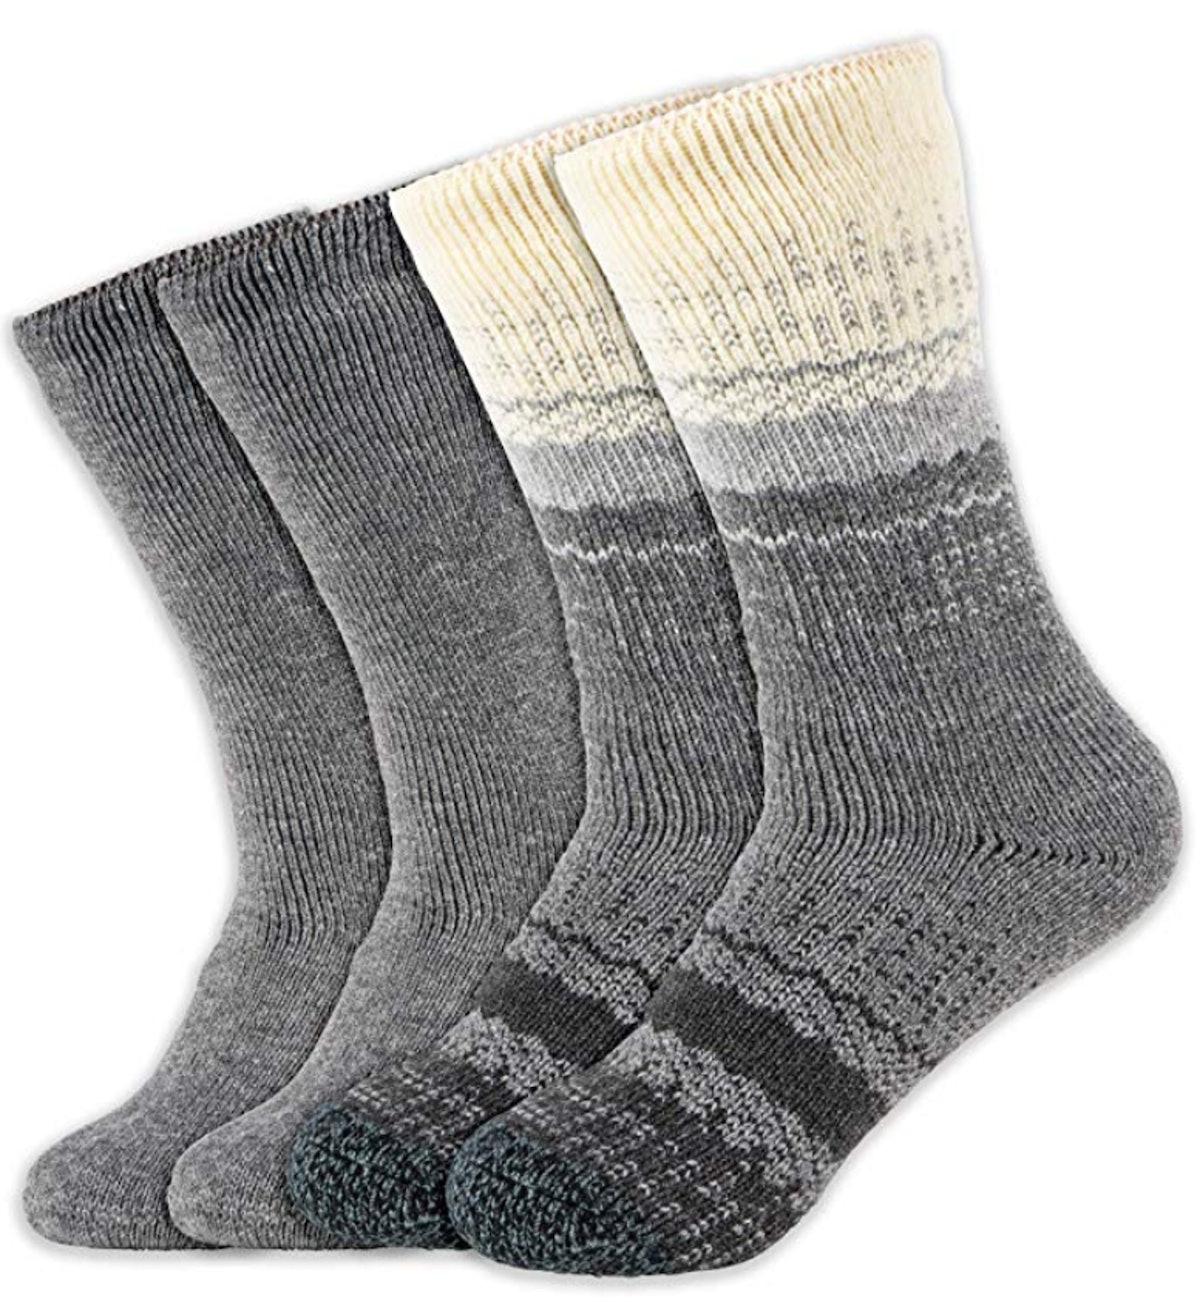 Hot Feet Heavy Thermal Sock (2 Pairs)